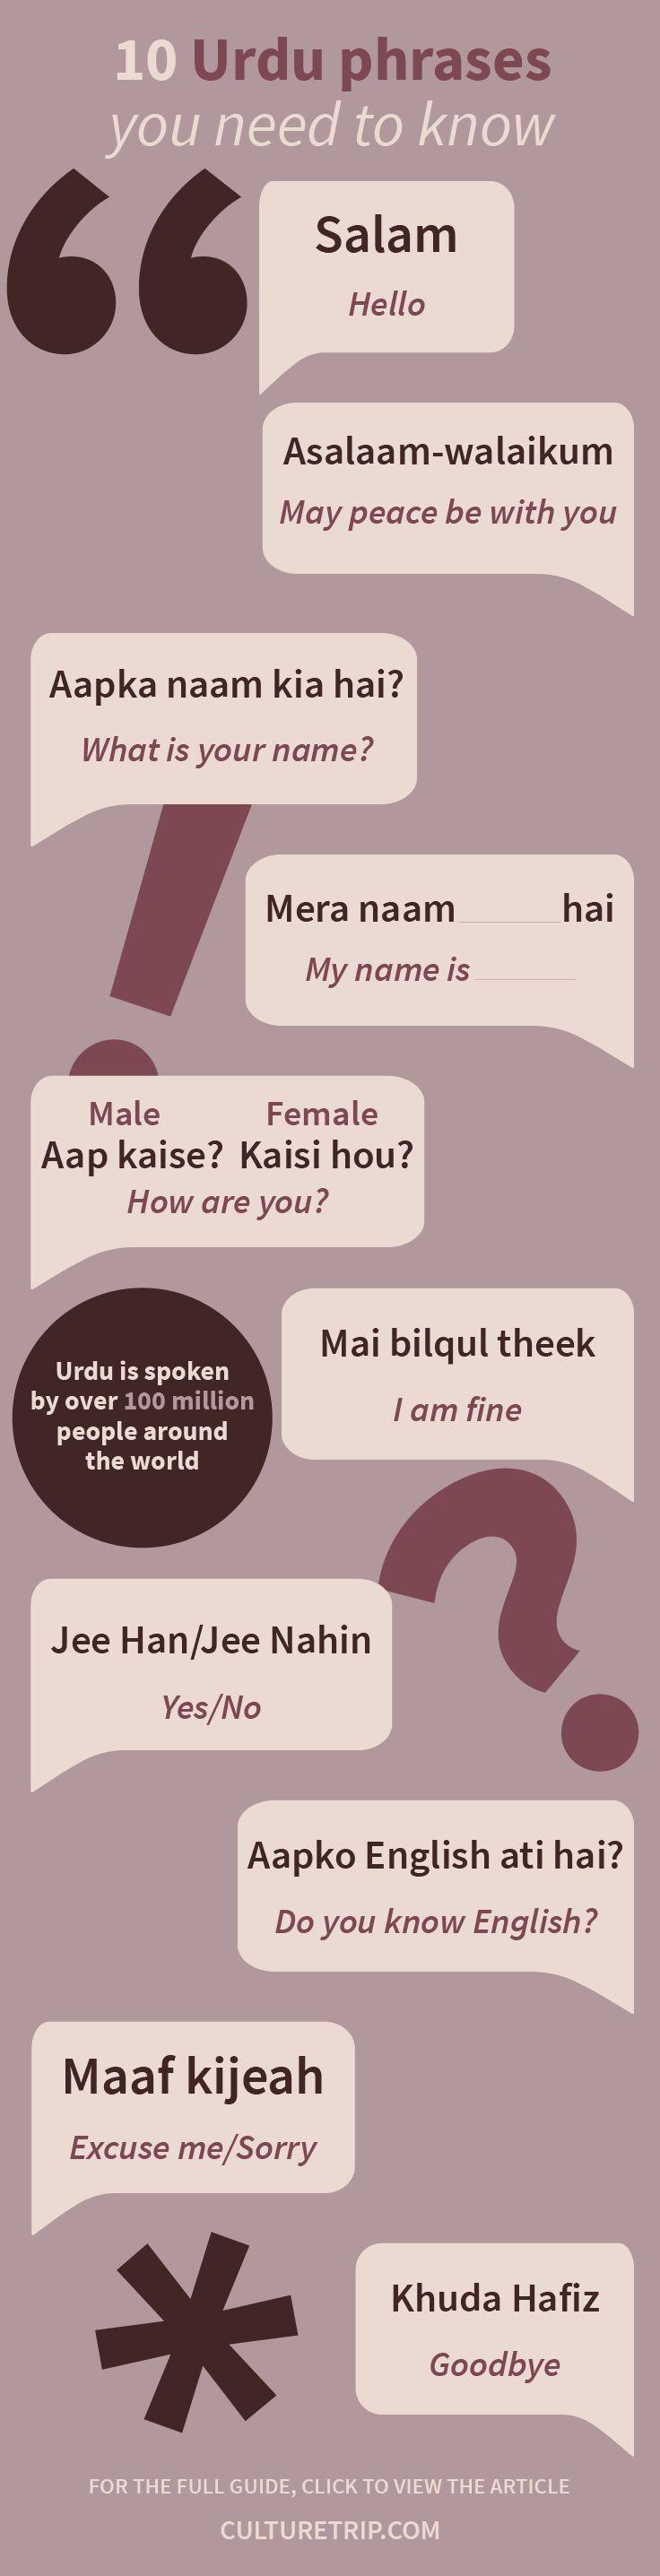 21 Essential Urdu Phrases Youll Need In Pakistan Pakistan